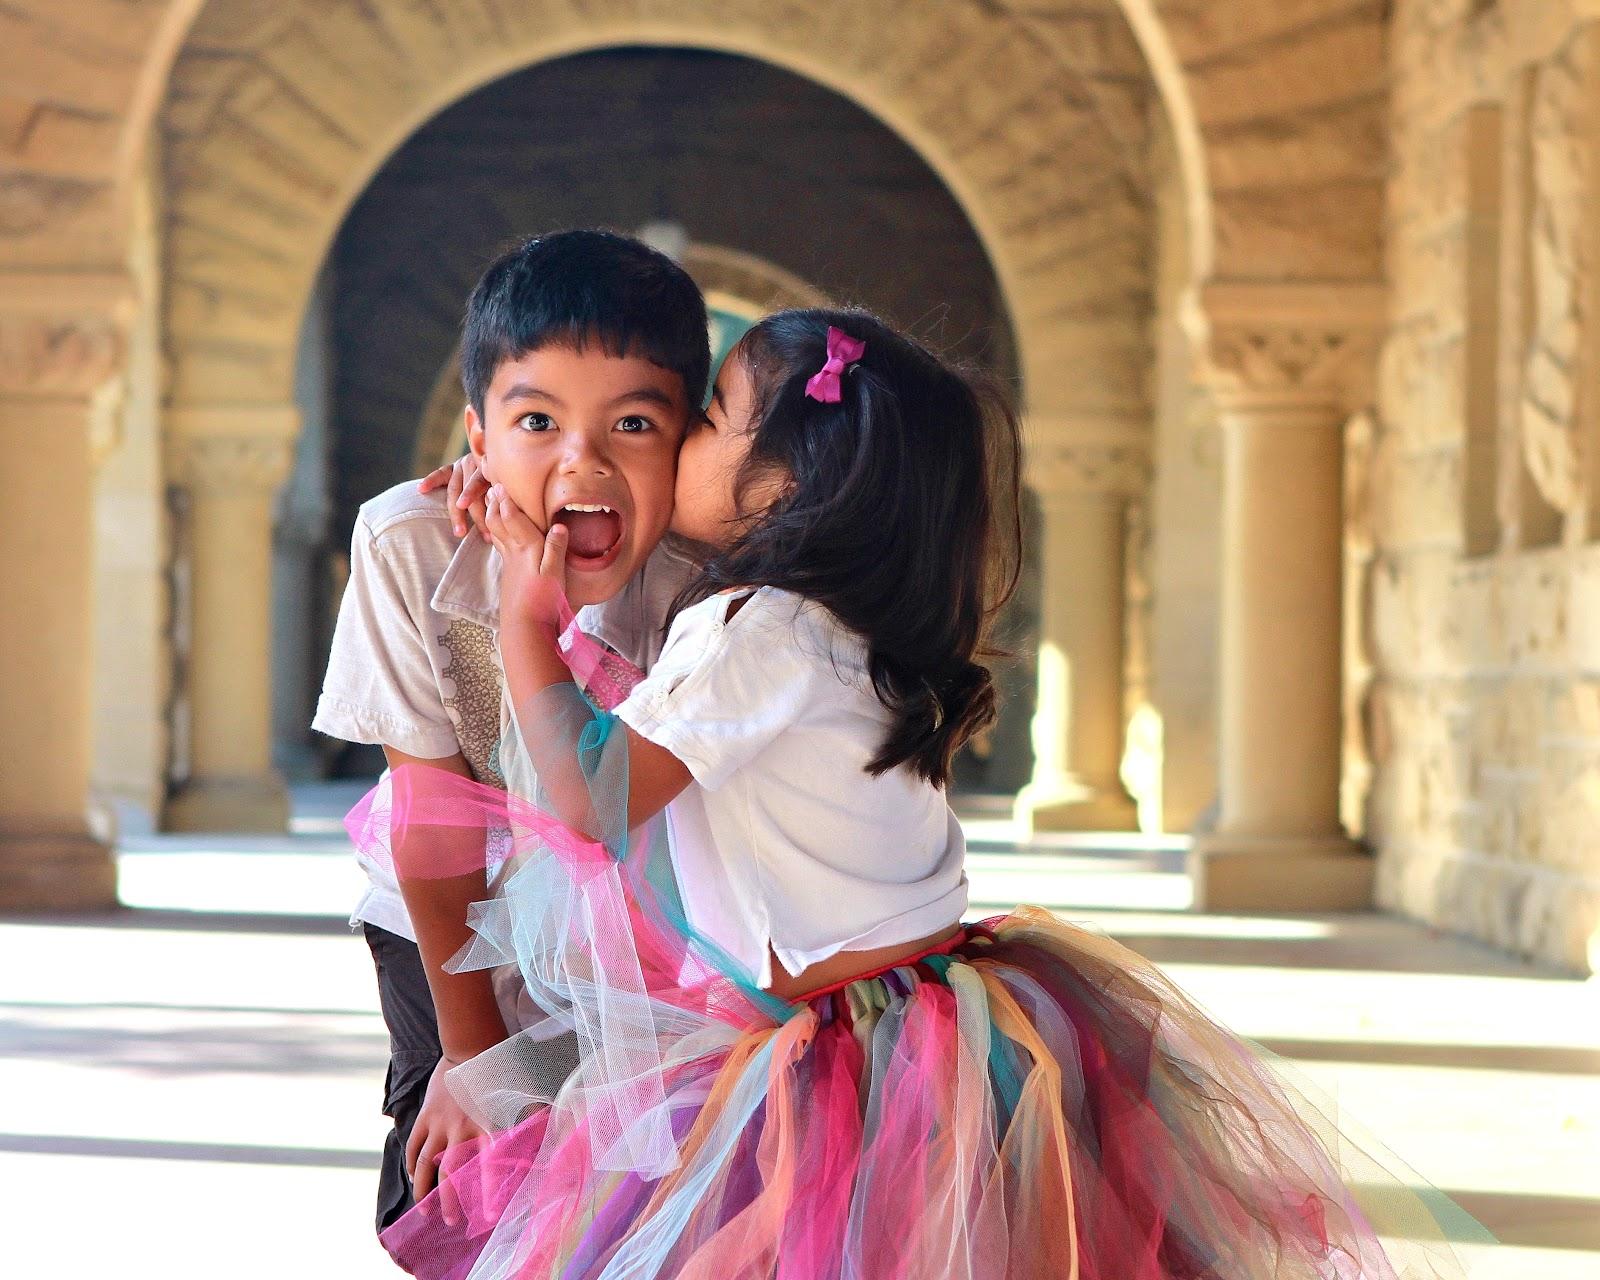 kids kisses I HEART FACES: Hugs and Kisses   Li'l Sis Kiss